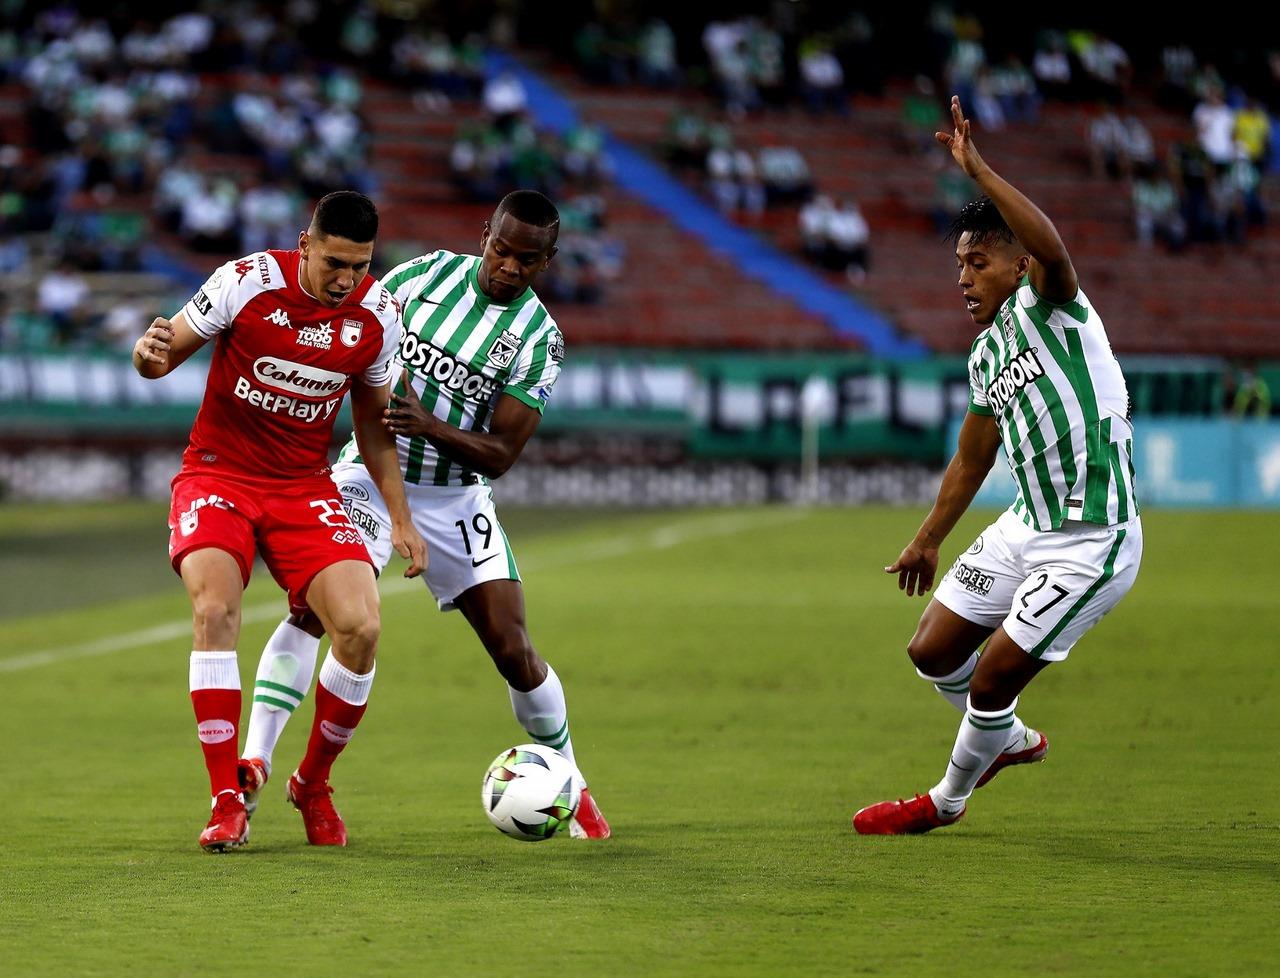 Nacional vs Santa Fe en la Copa 2